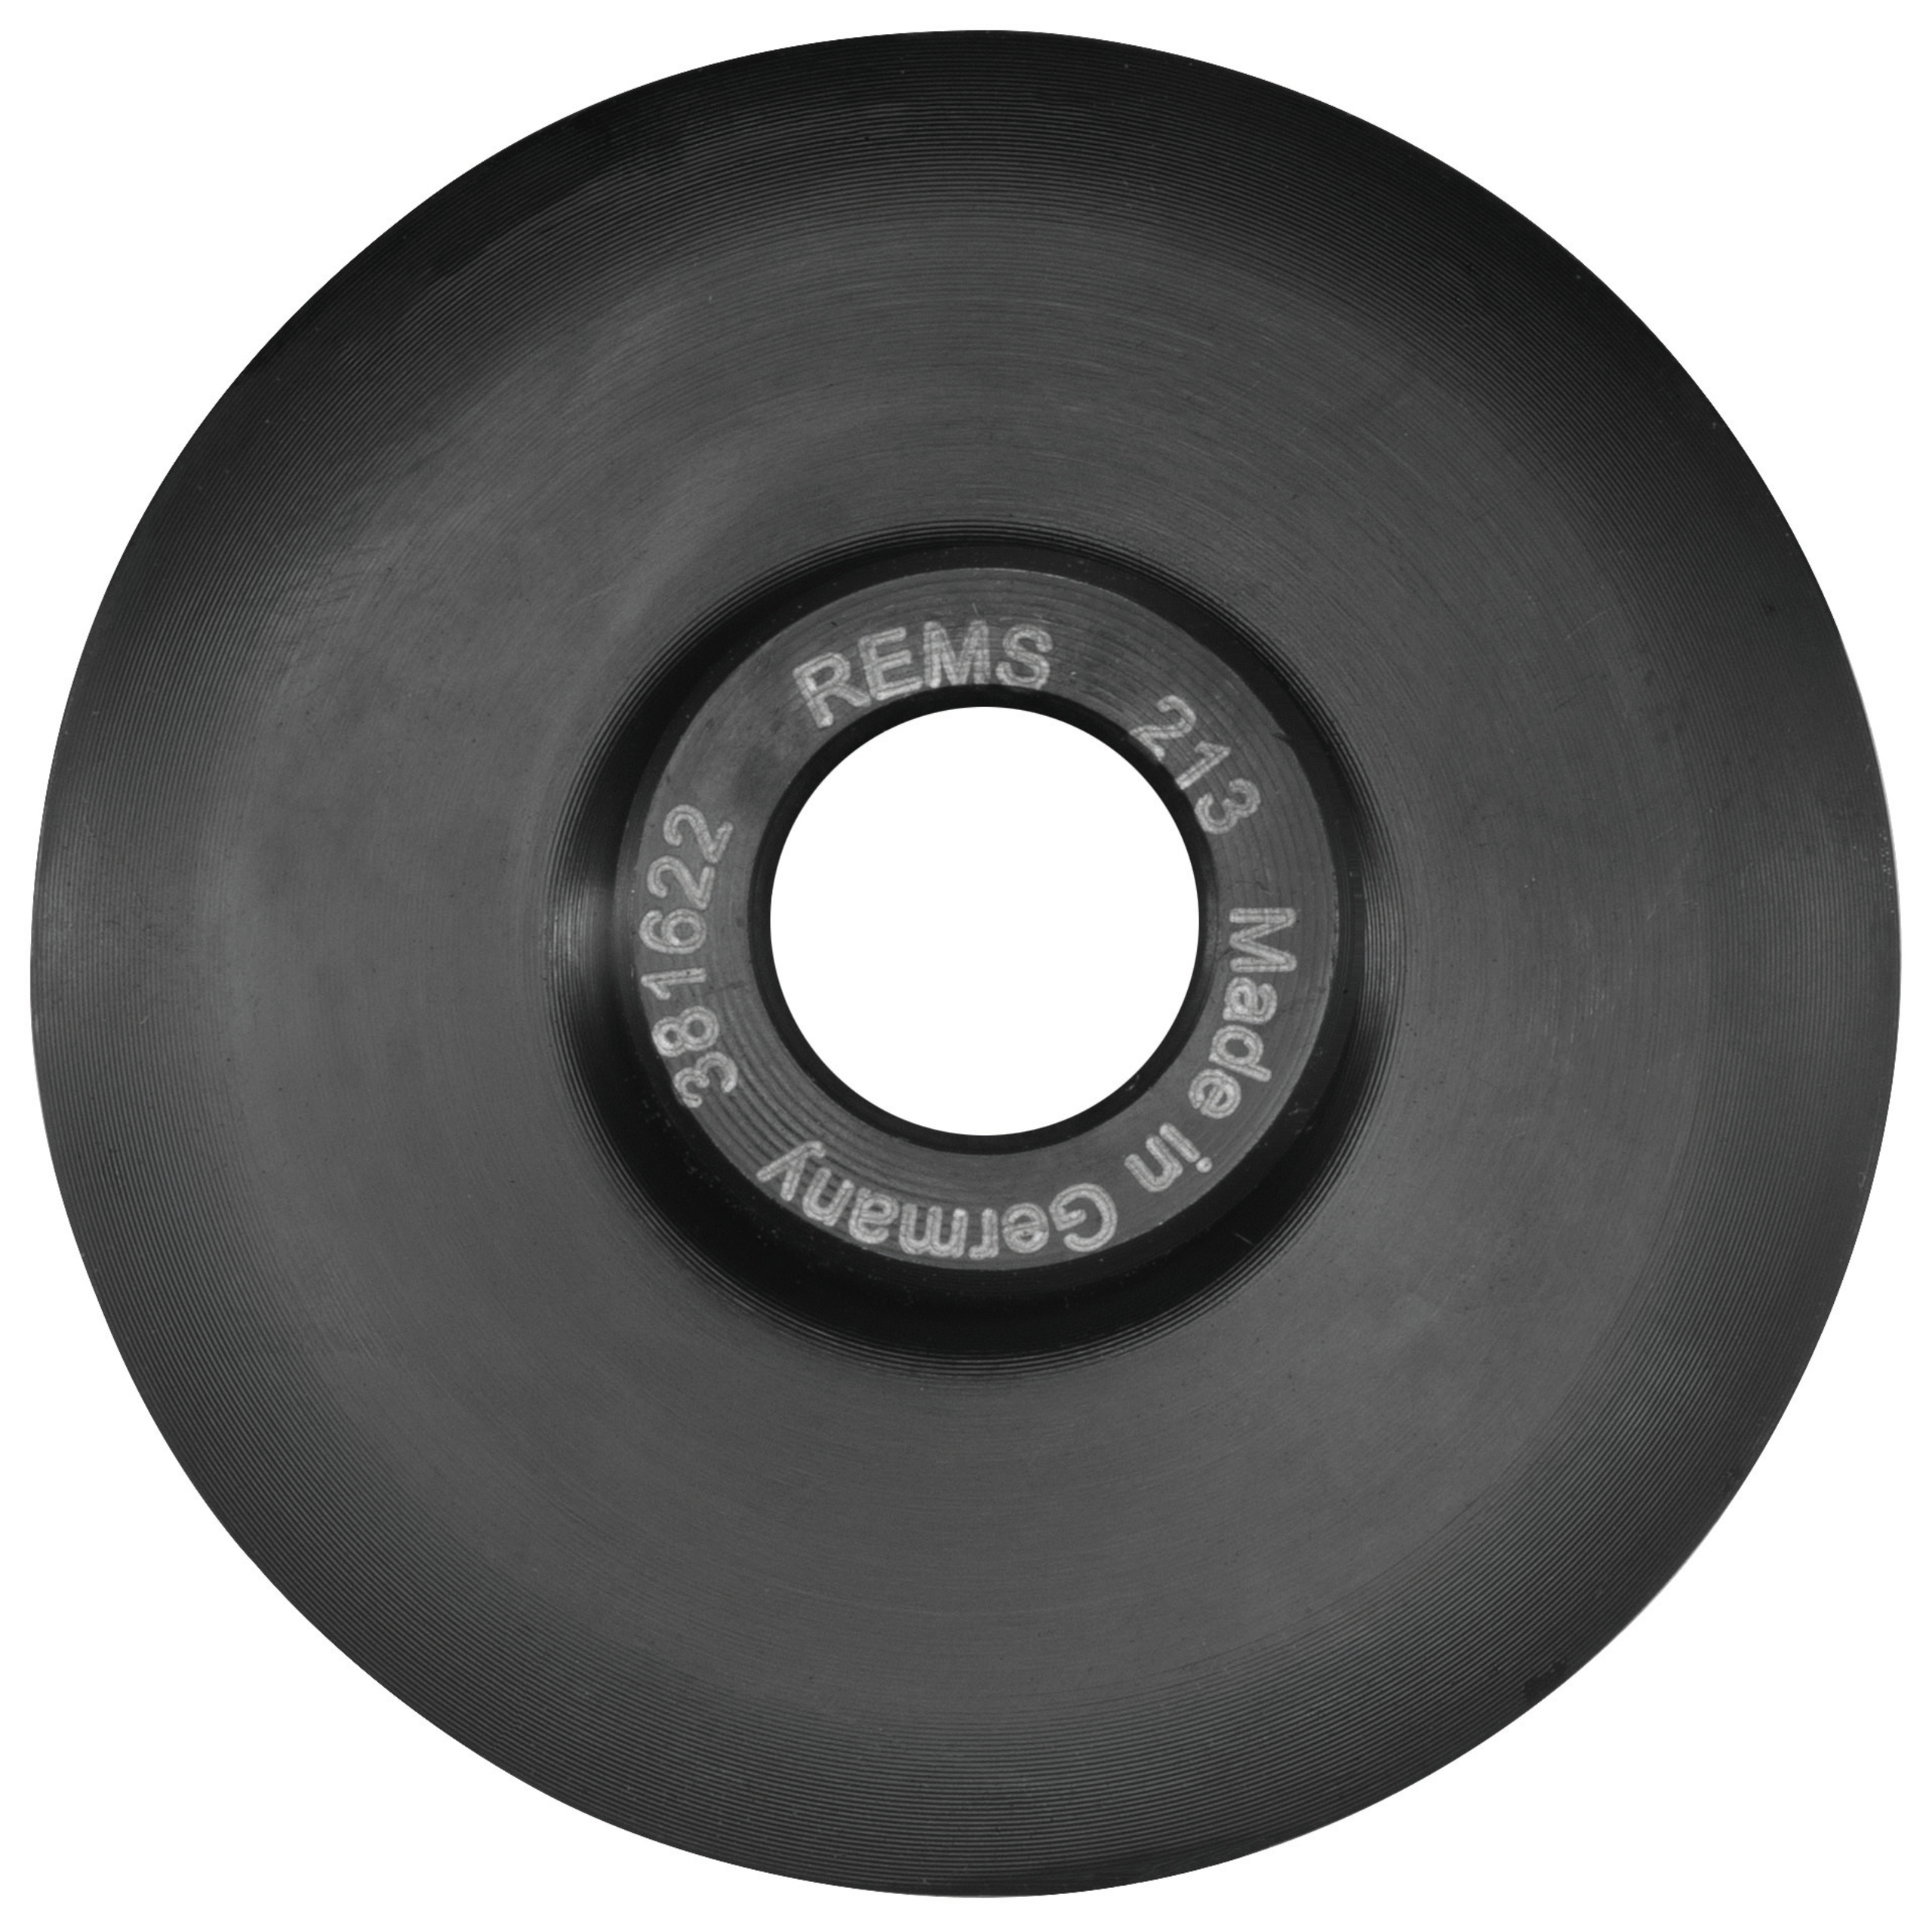 <br/>REMS cutter wheel St 1-4